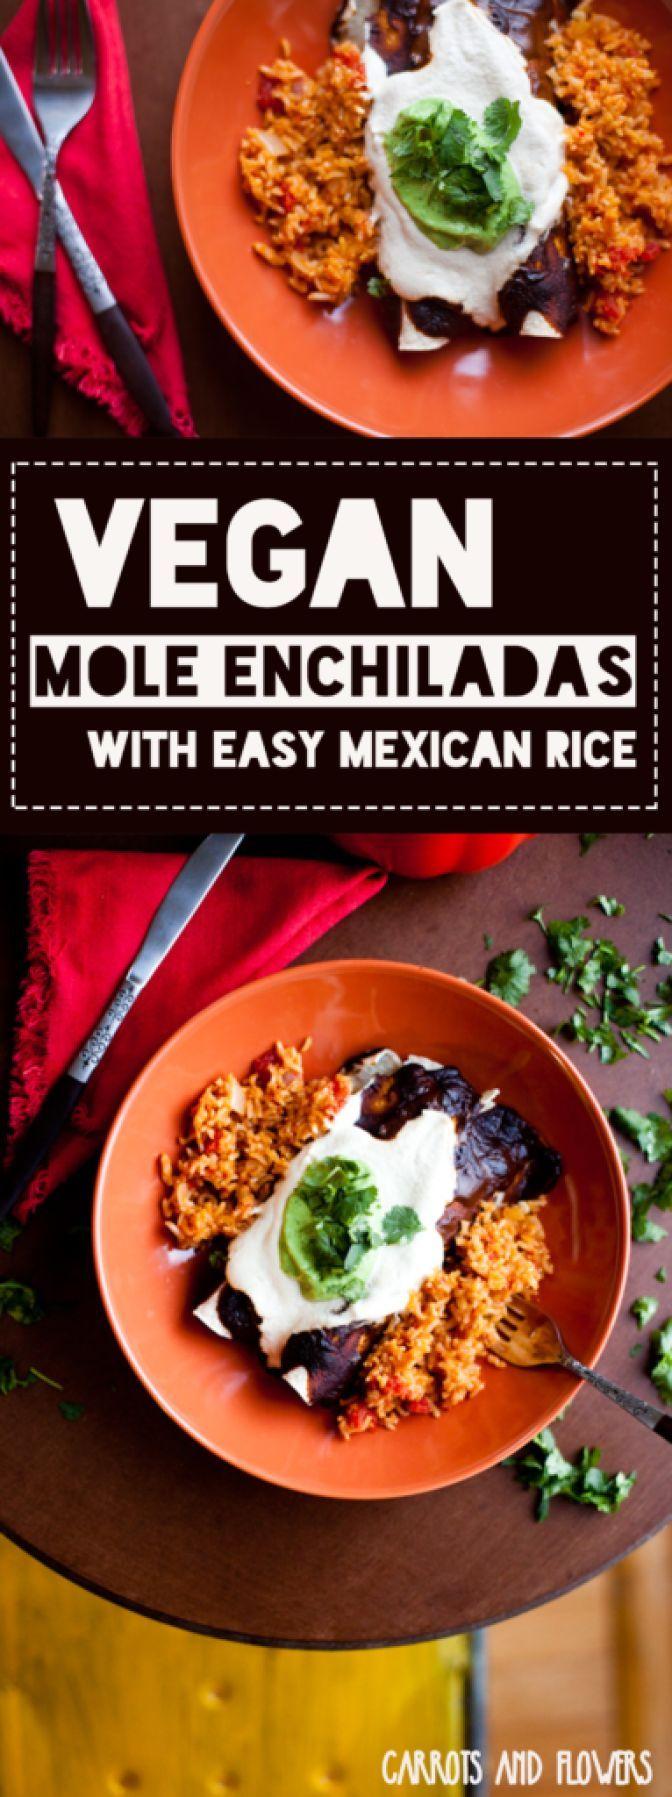 The BEST Vegan Enchiladas   Mole Enchiladas with Easy Mexican Rice   Family Dinner Recipe  